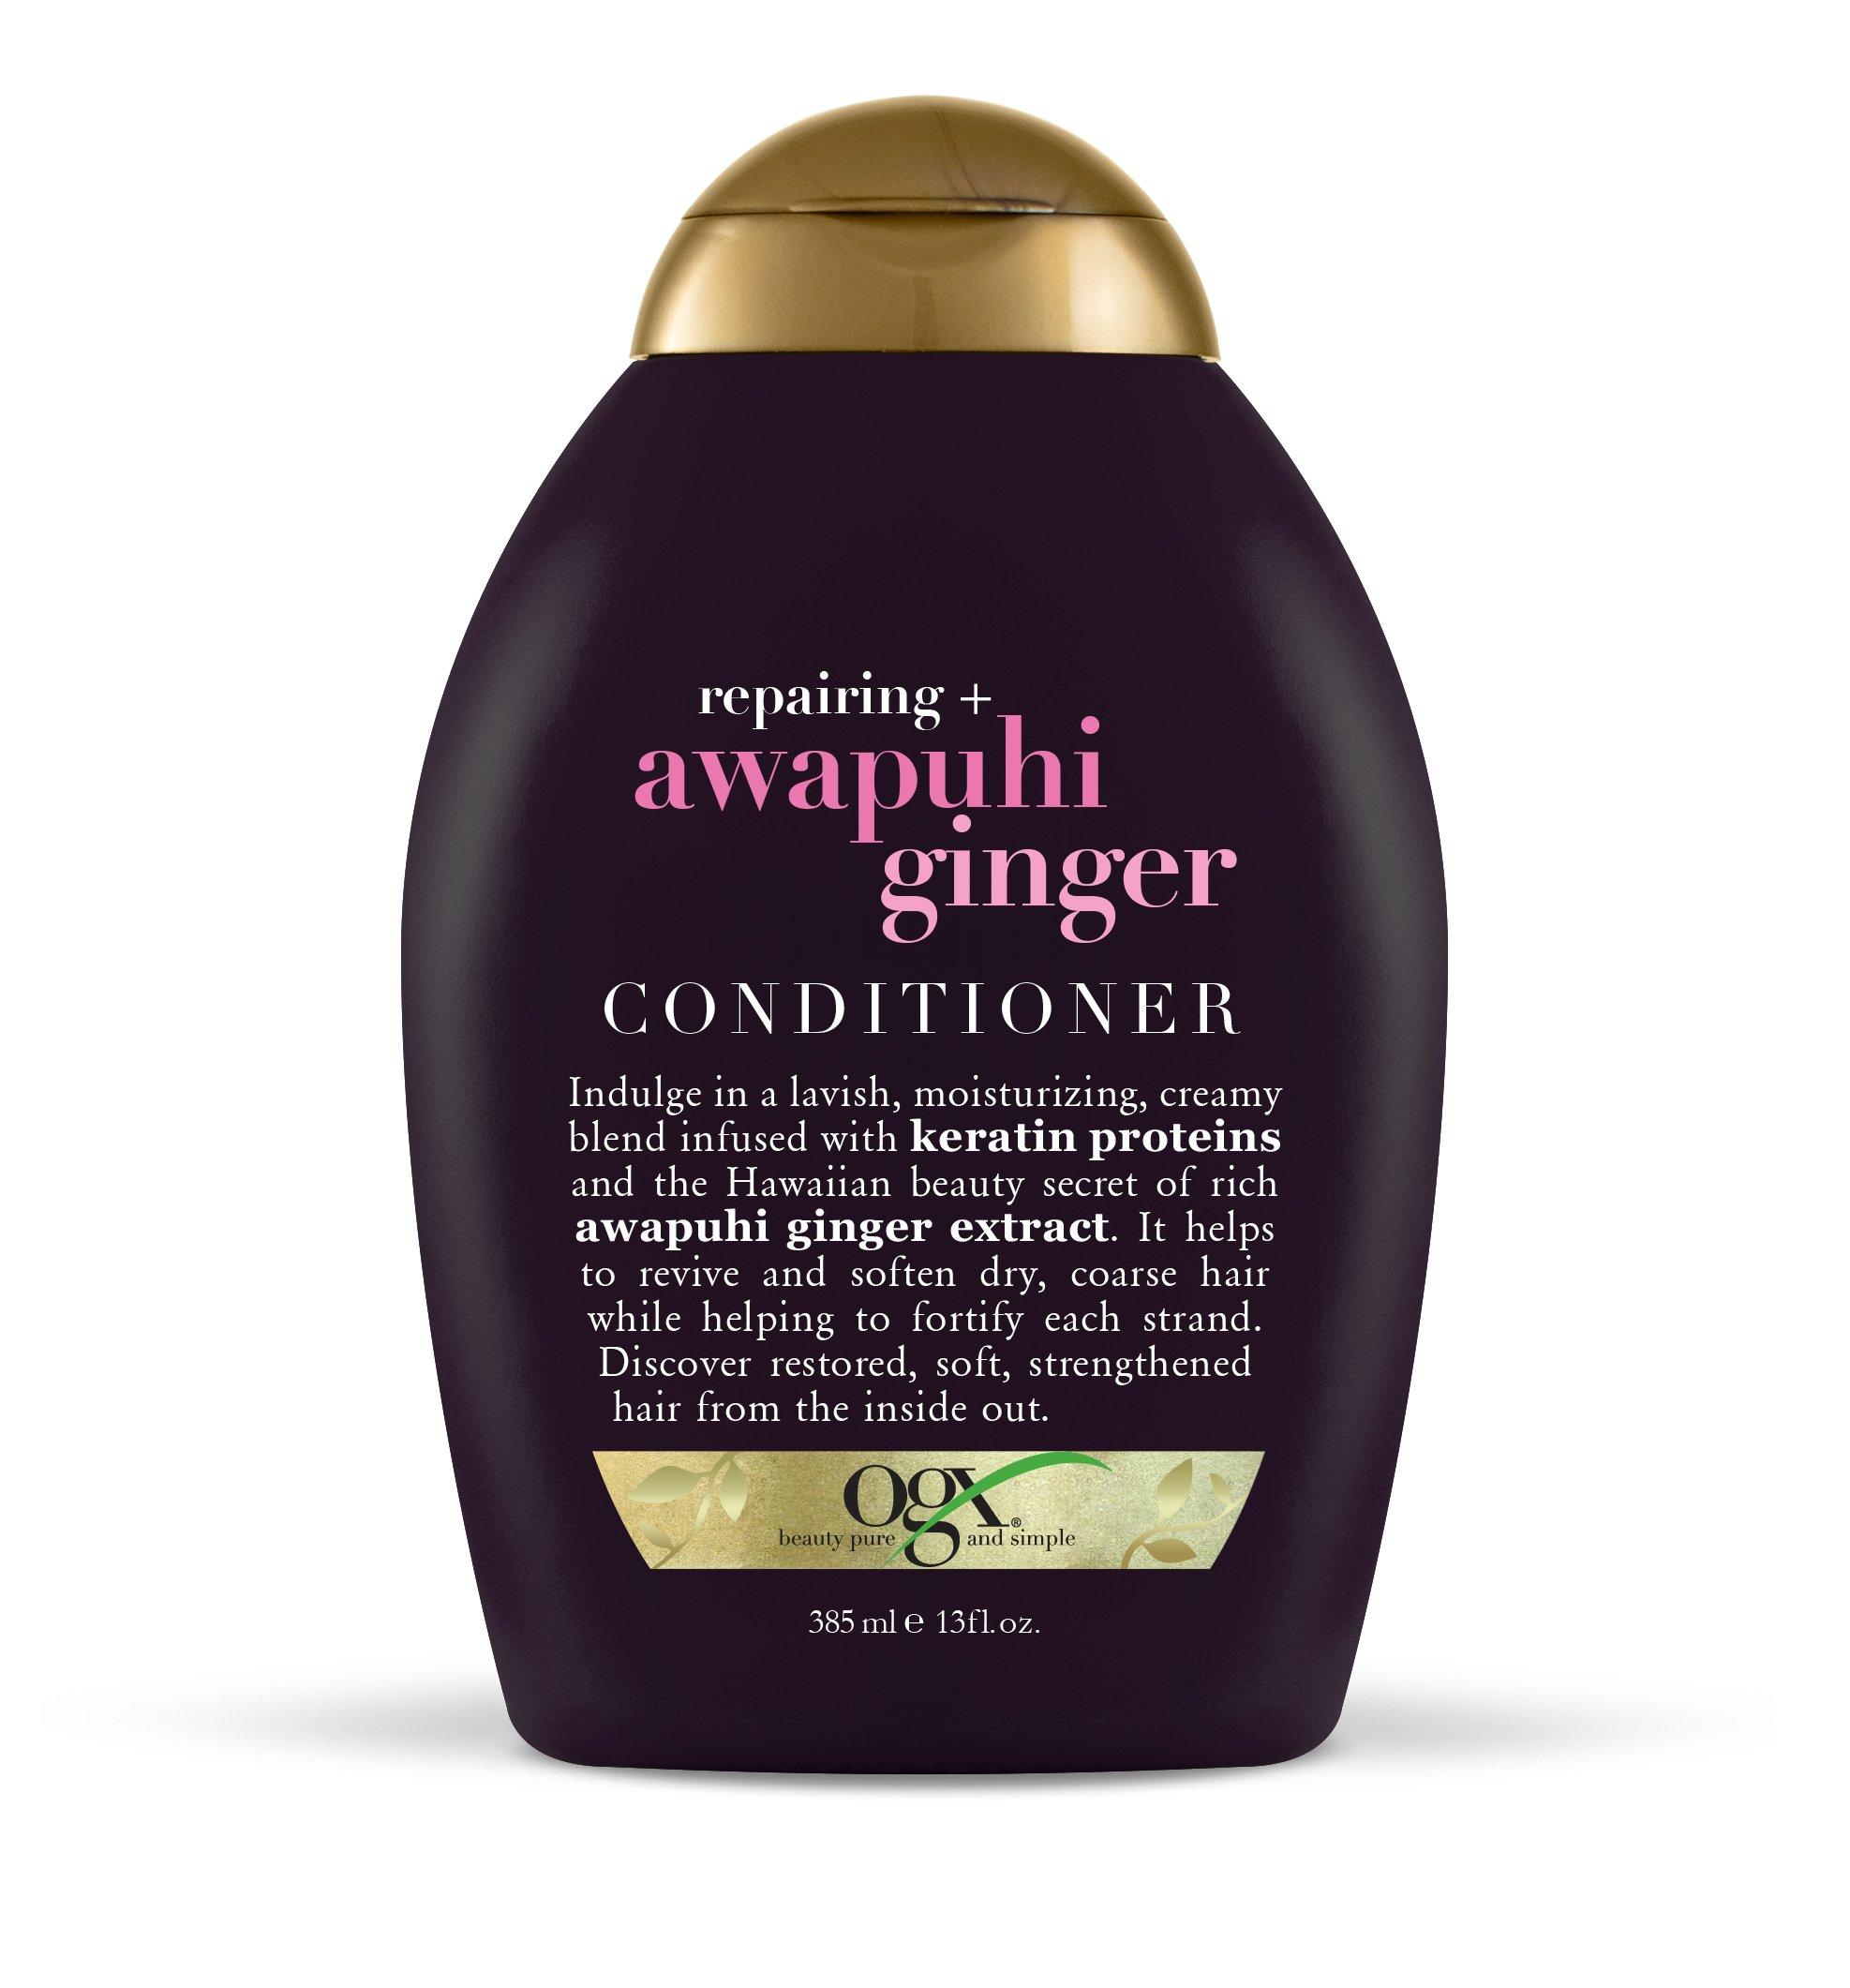 OGX - OGX Reparing + Awapuhi Ginger Conditioner, 13 Ounce